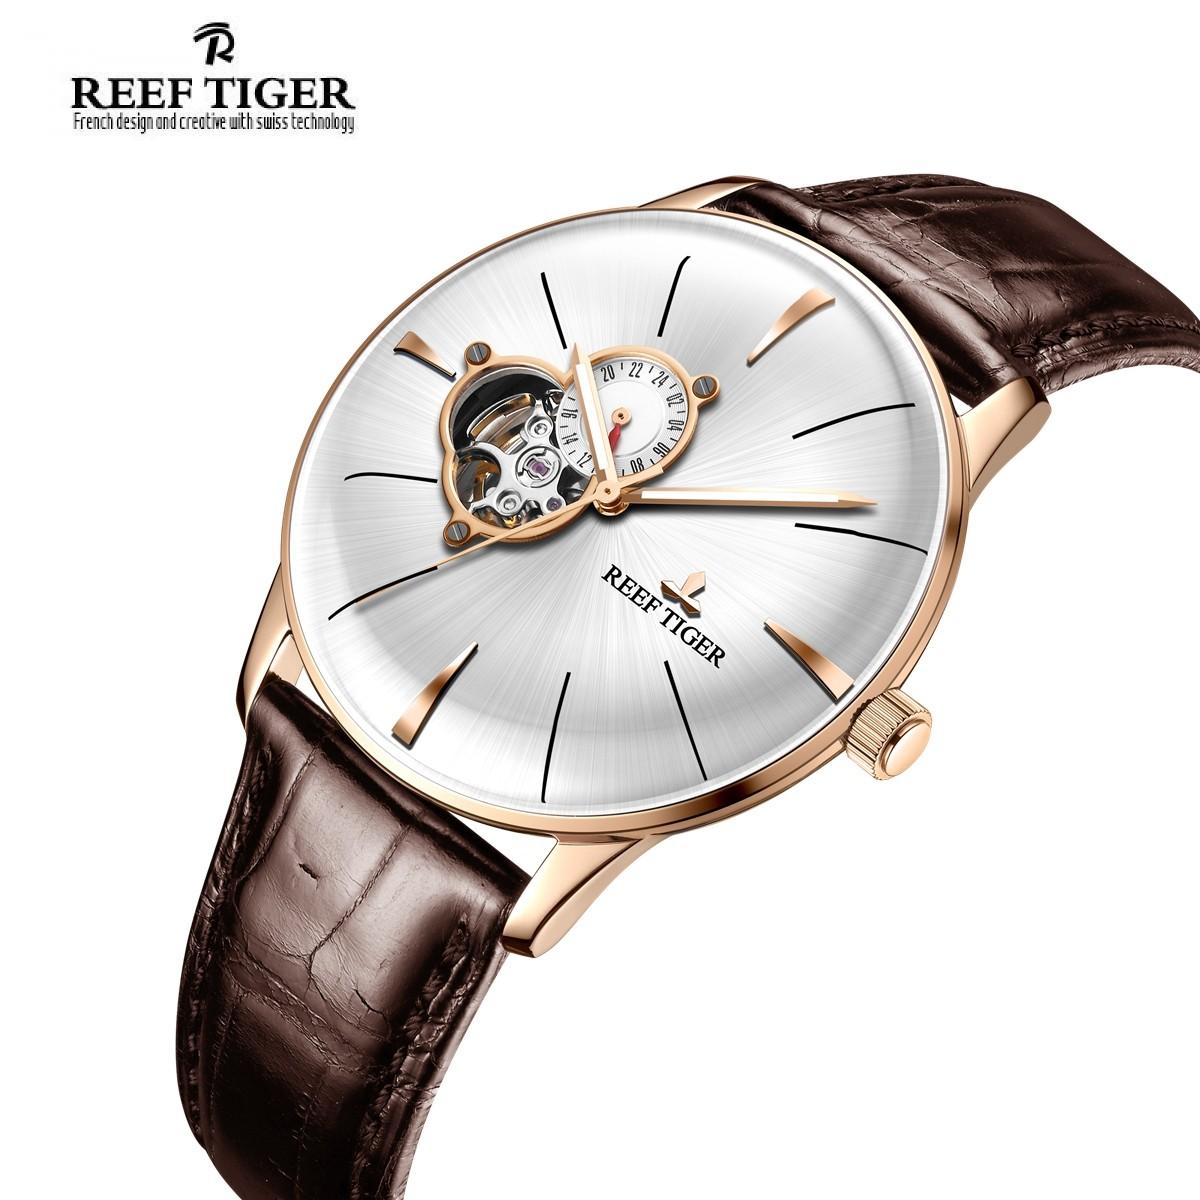 Đồng hồ Reef Tiger8239 PWB